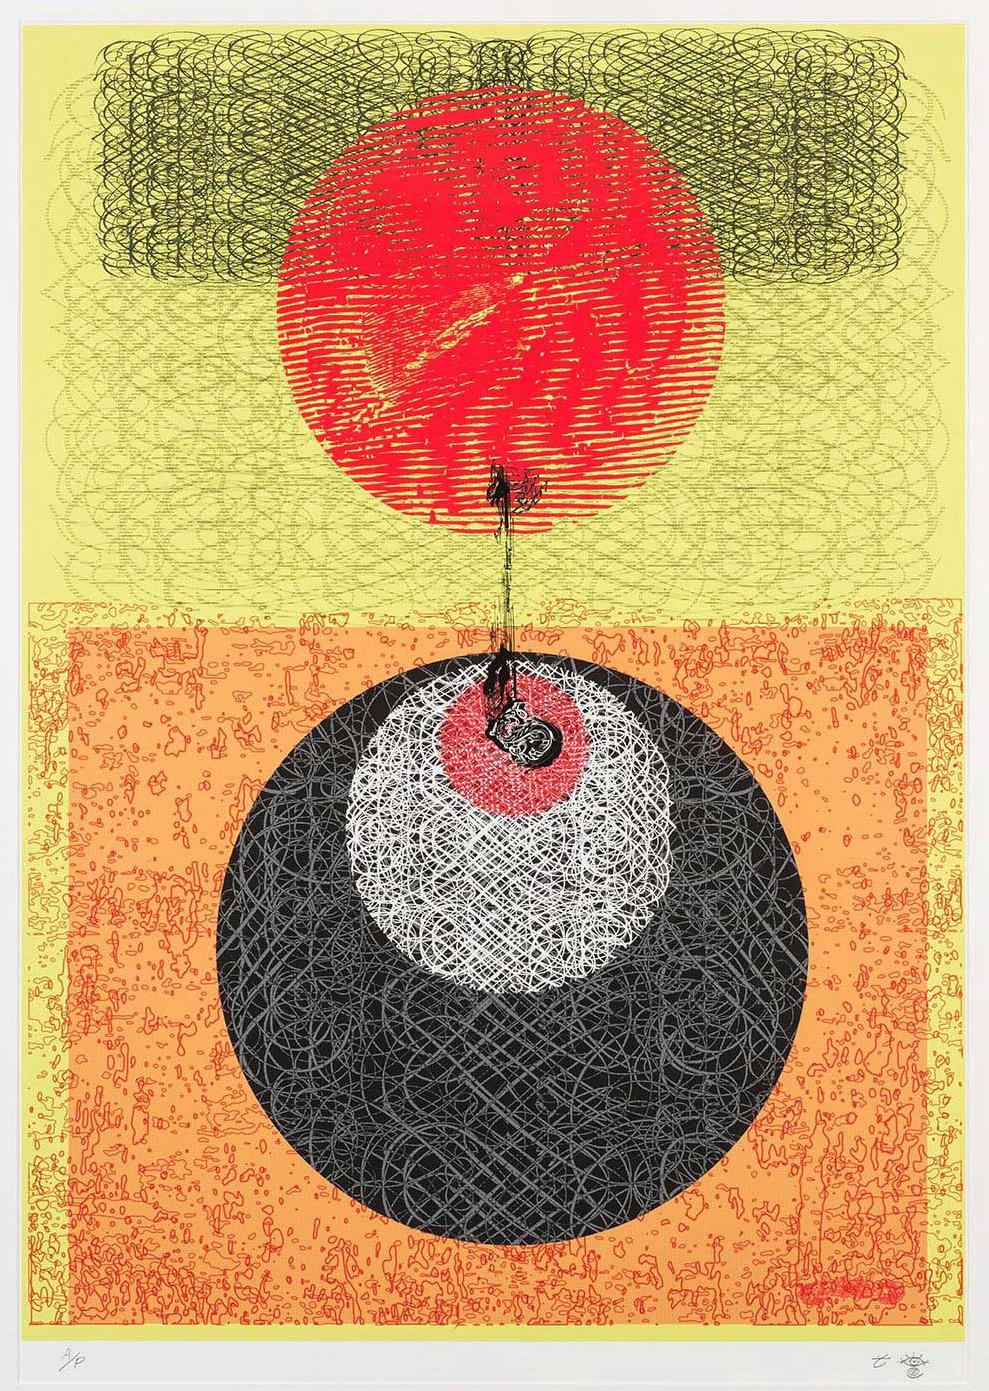 Theresa Choe-Herrington - Study for Mandala Embroidery